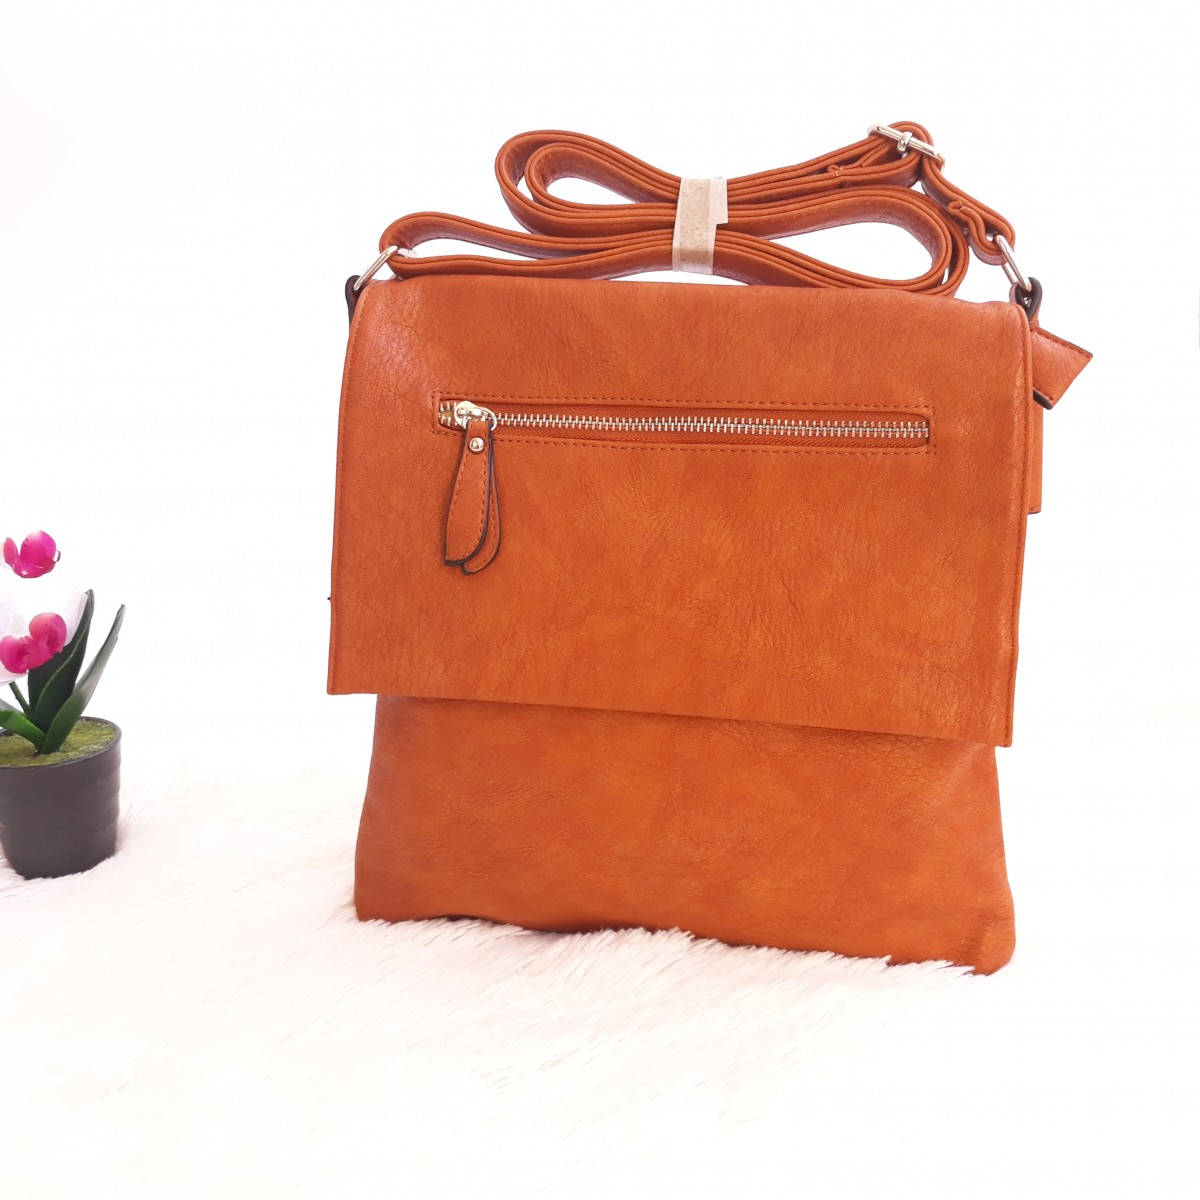 Дамска чанта през рамо - код 2909 - кафява